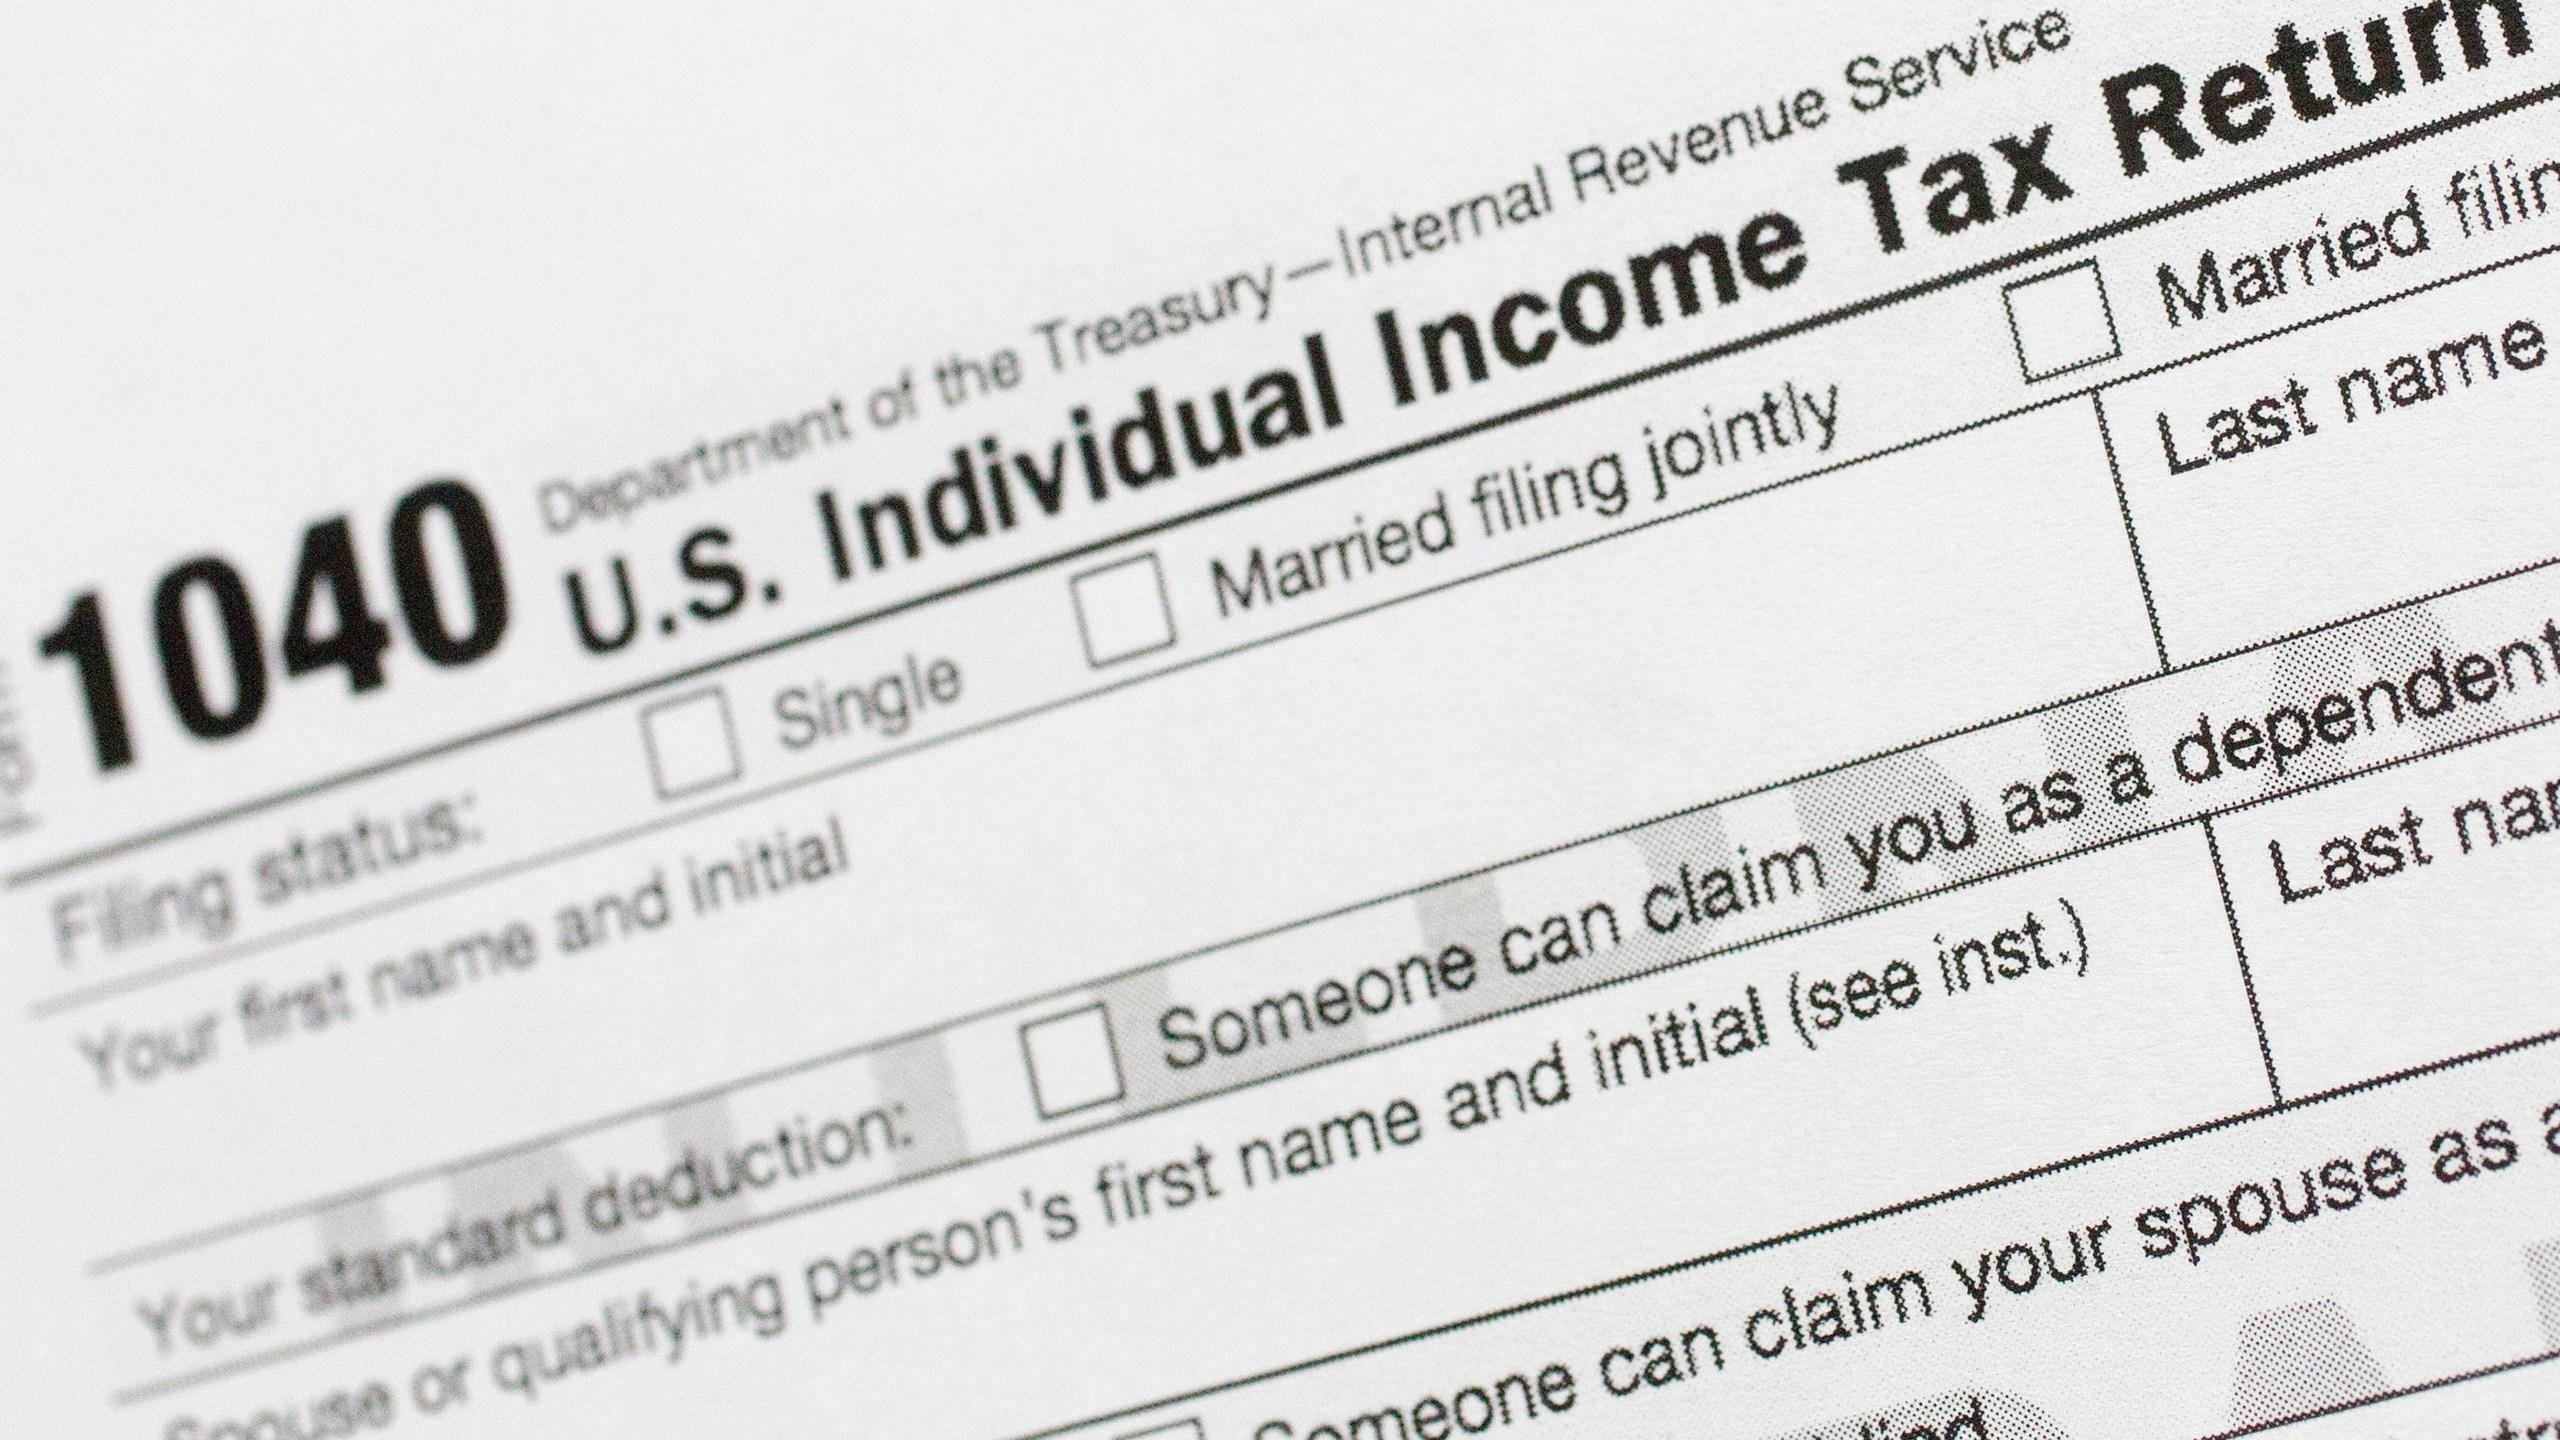 Tax Season Begins